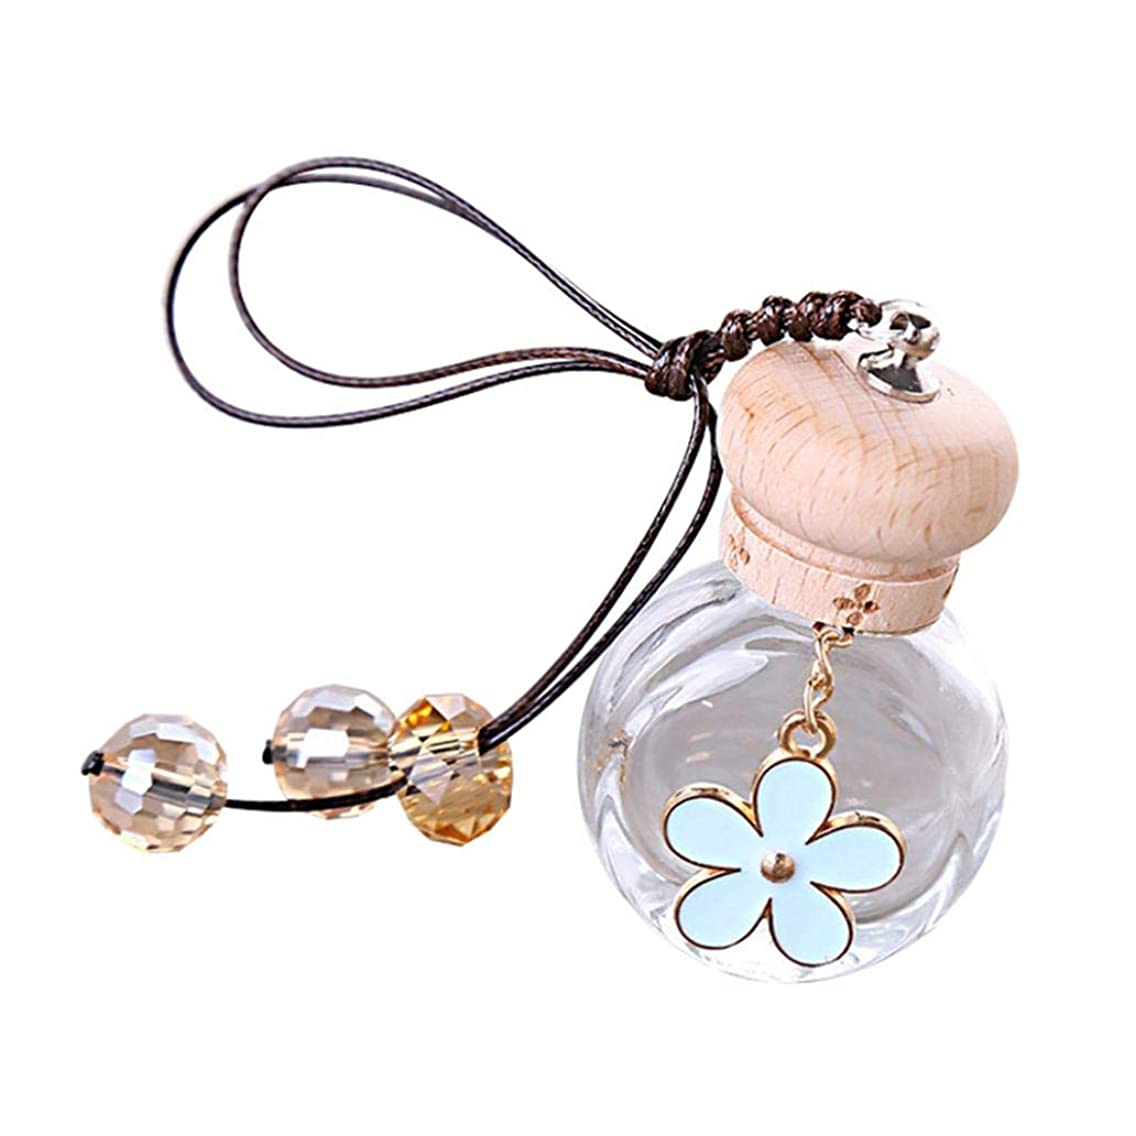 Aroma Diffuser Lovely Flower Glass Empty Perfume Bottle Pendant Car Hanging Ornament Decor - Blue